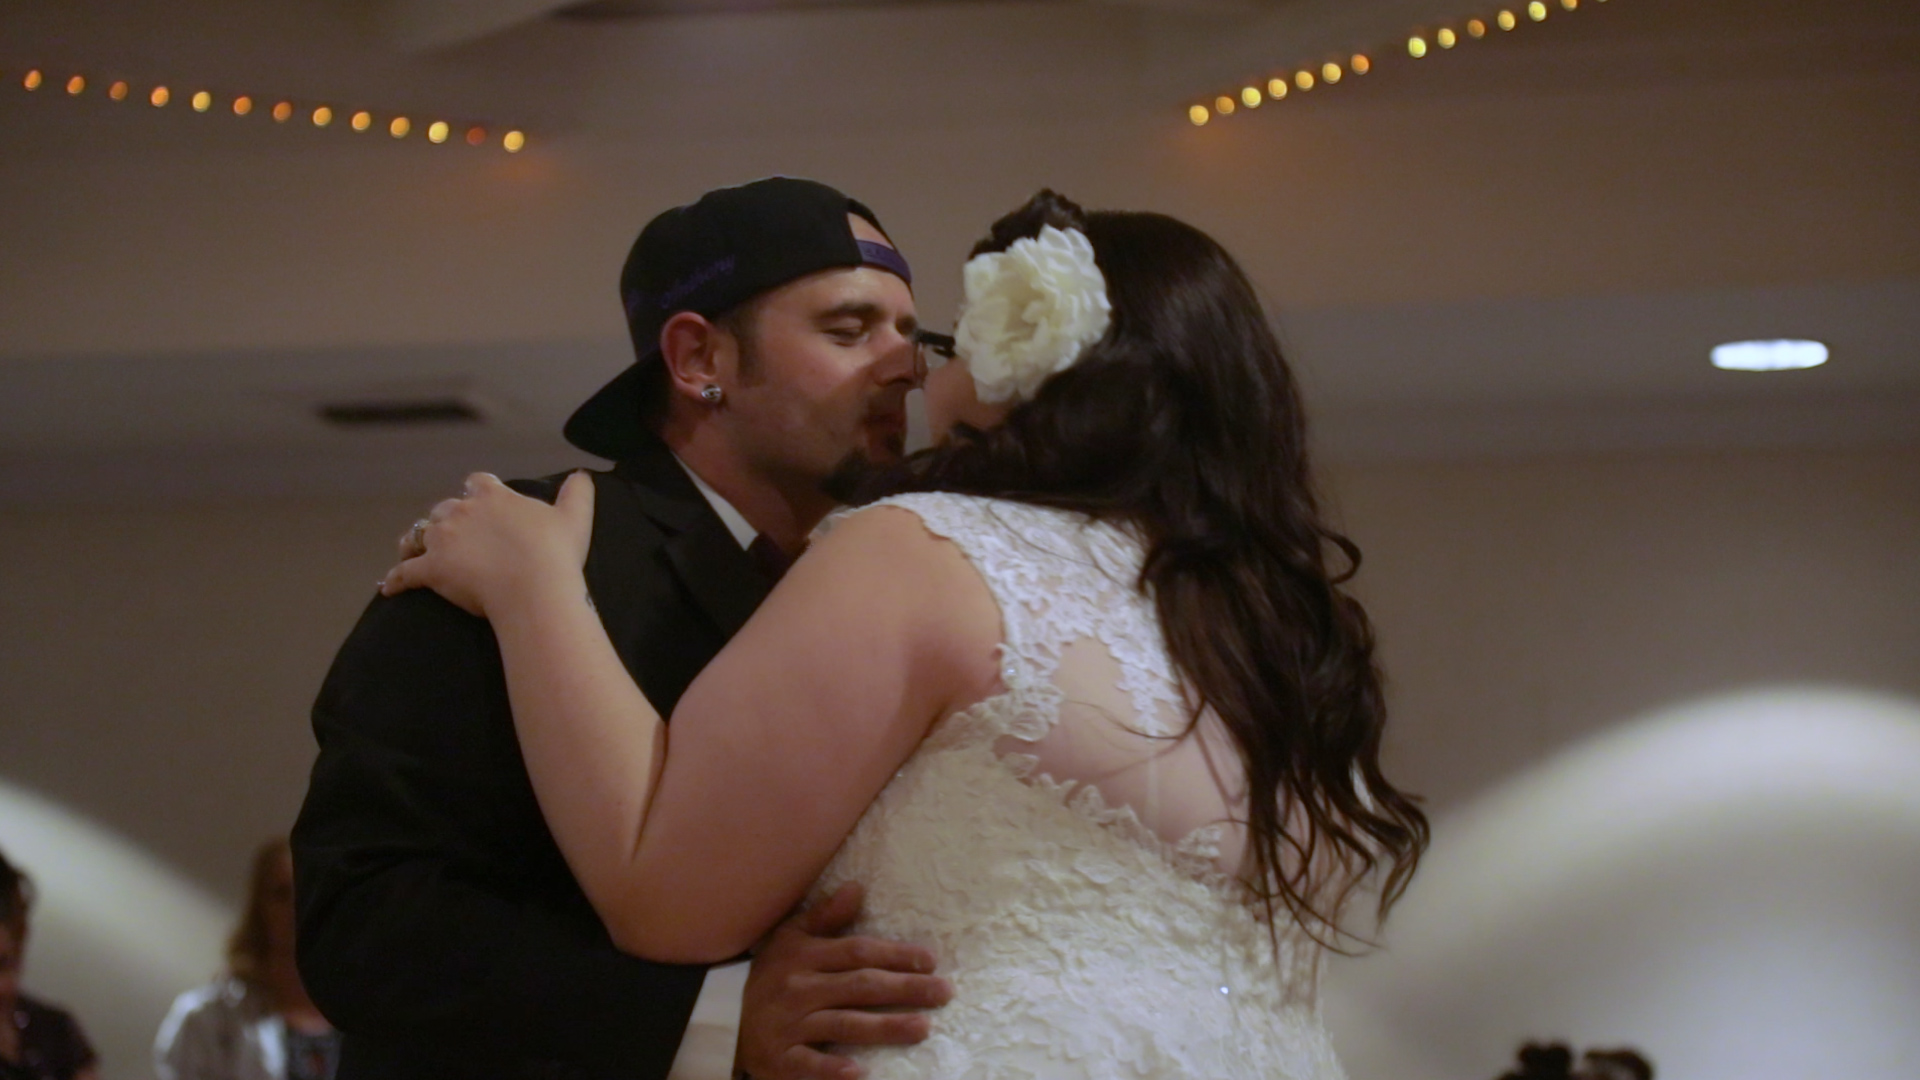 Dariana Anthony Wedding 2018 RECEPTION.01_29_08_02.Still037.jpg